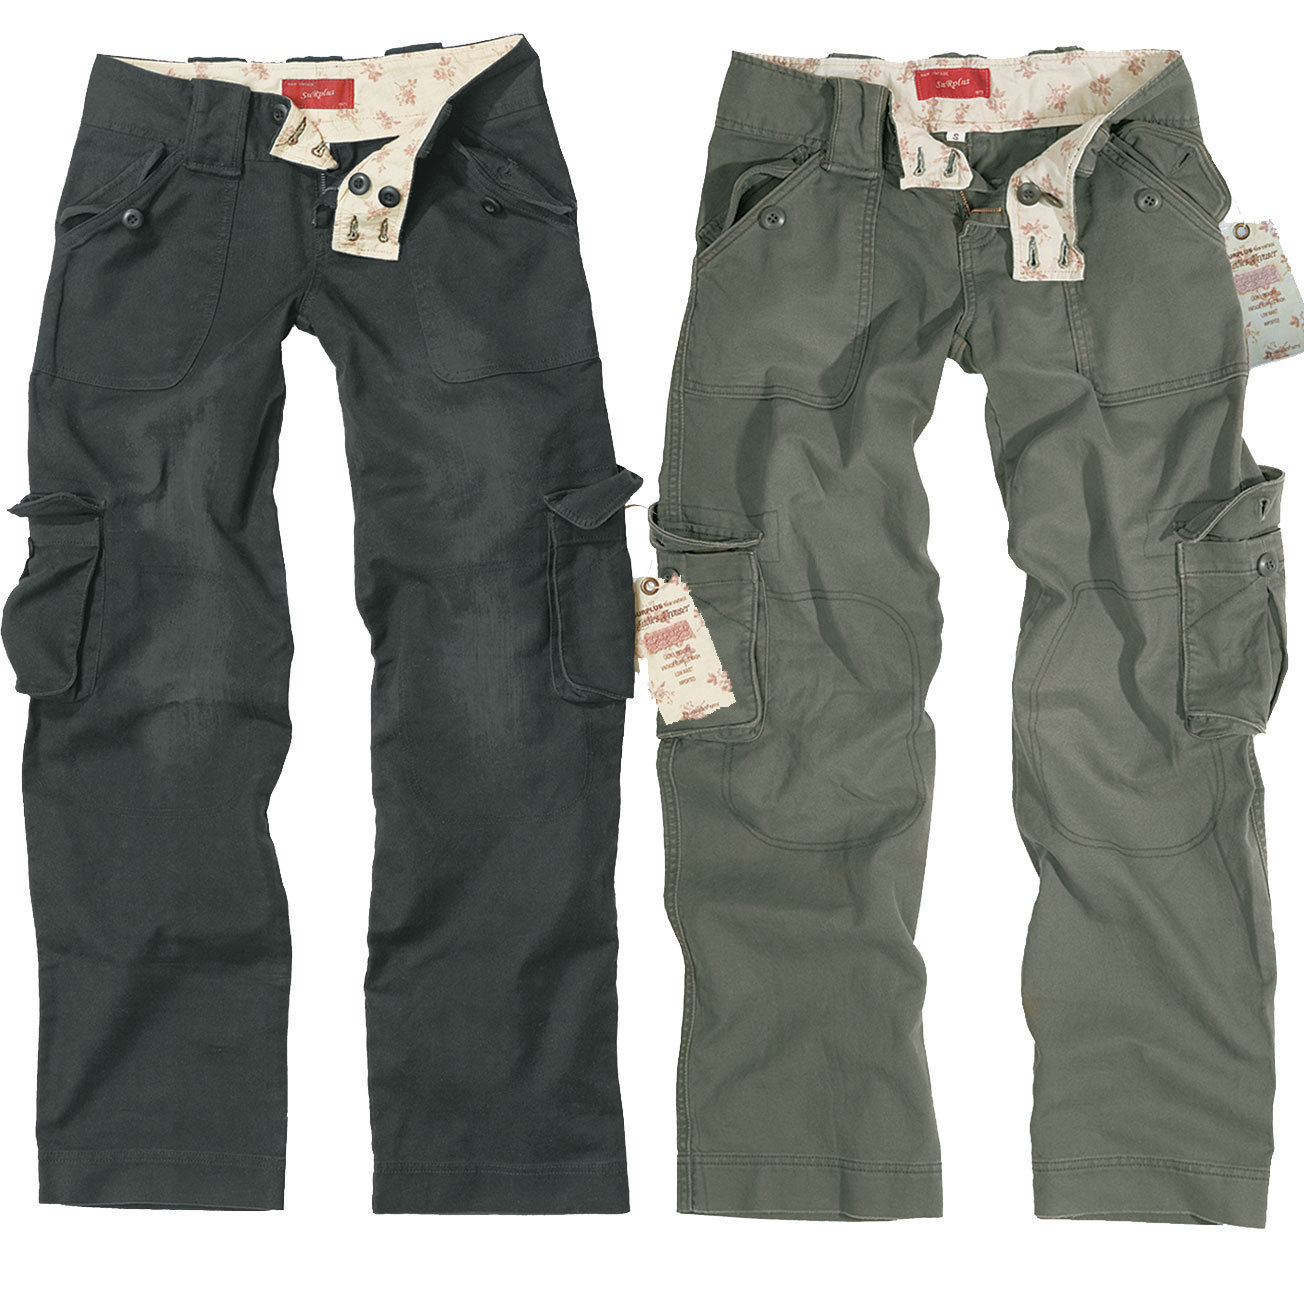 surplus ladies vintage trouser schwarz oliv gr 34 42 damen cargo hose trousers ebay. Black Bedroom Furniture Sets. Home Design Ideas